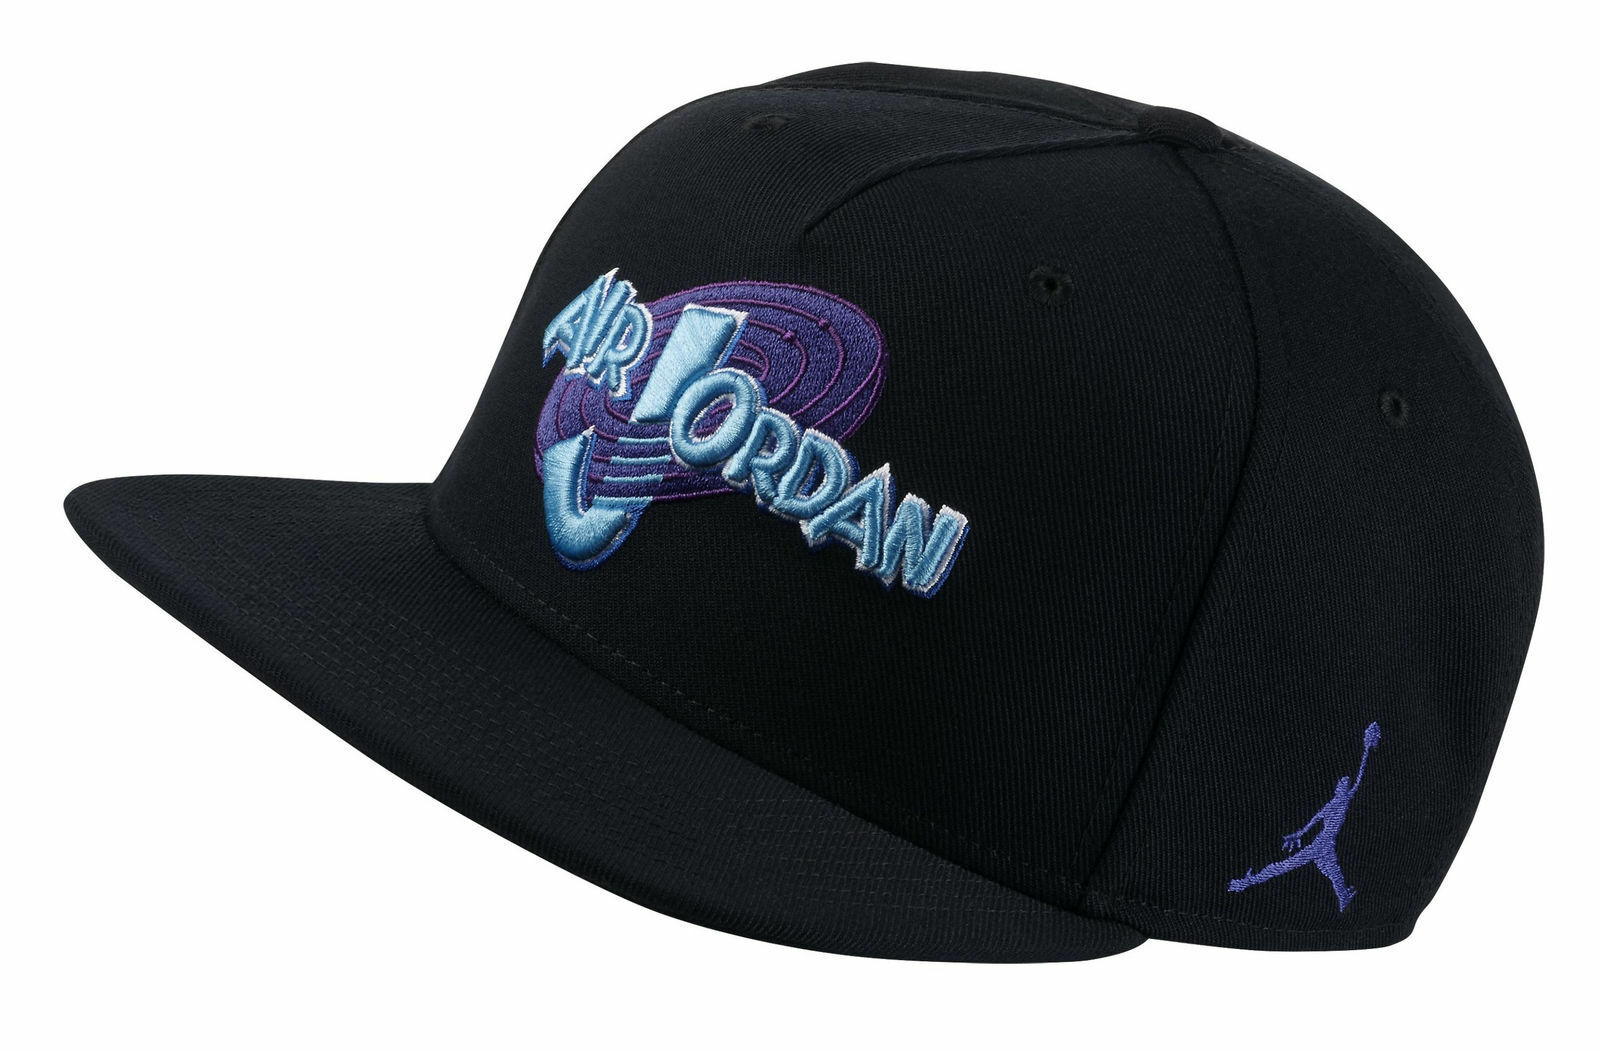 fa9fafea Nike Air Jordan Space Jam Snapback Hat - Black for sale online | eBay